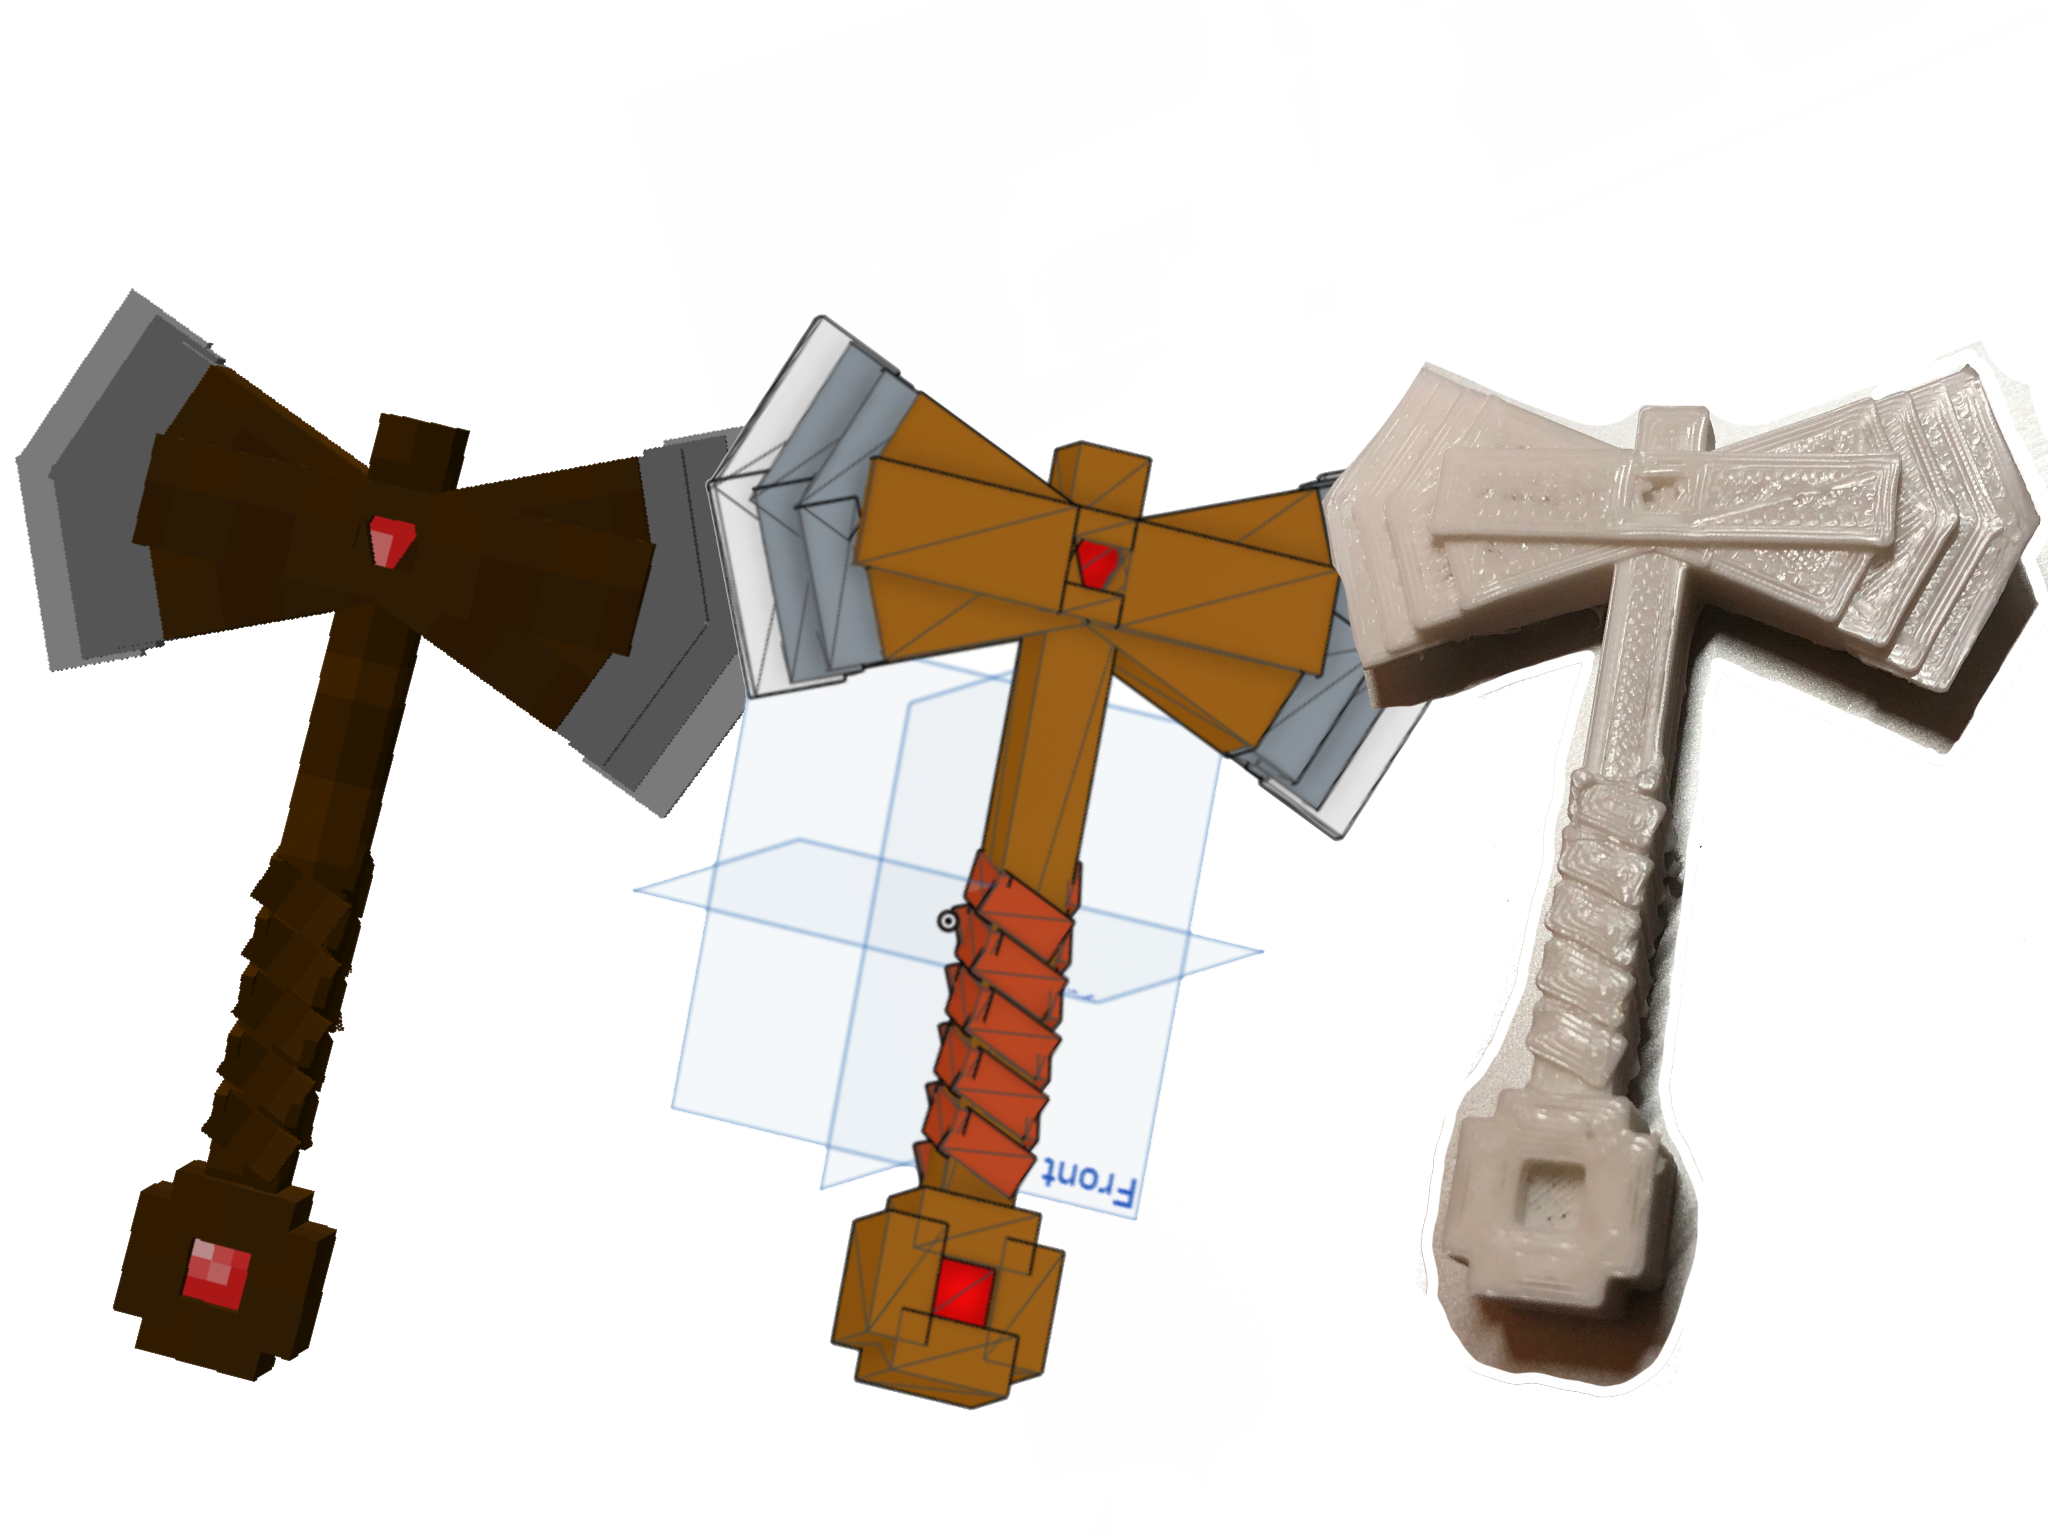 3D printed a few of my Minecraft models!